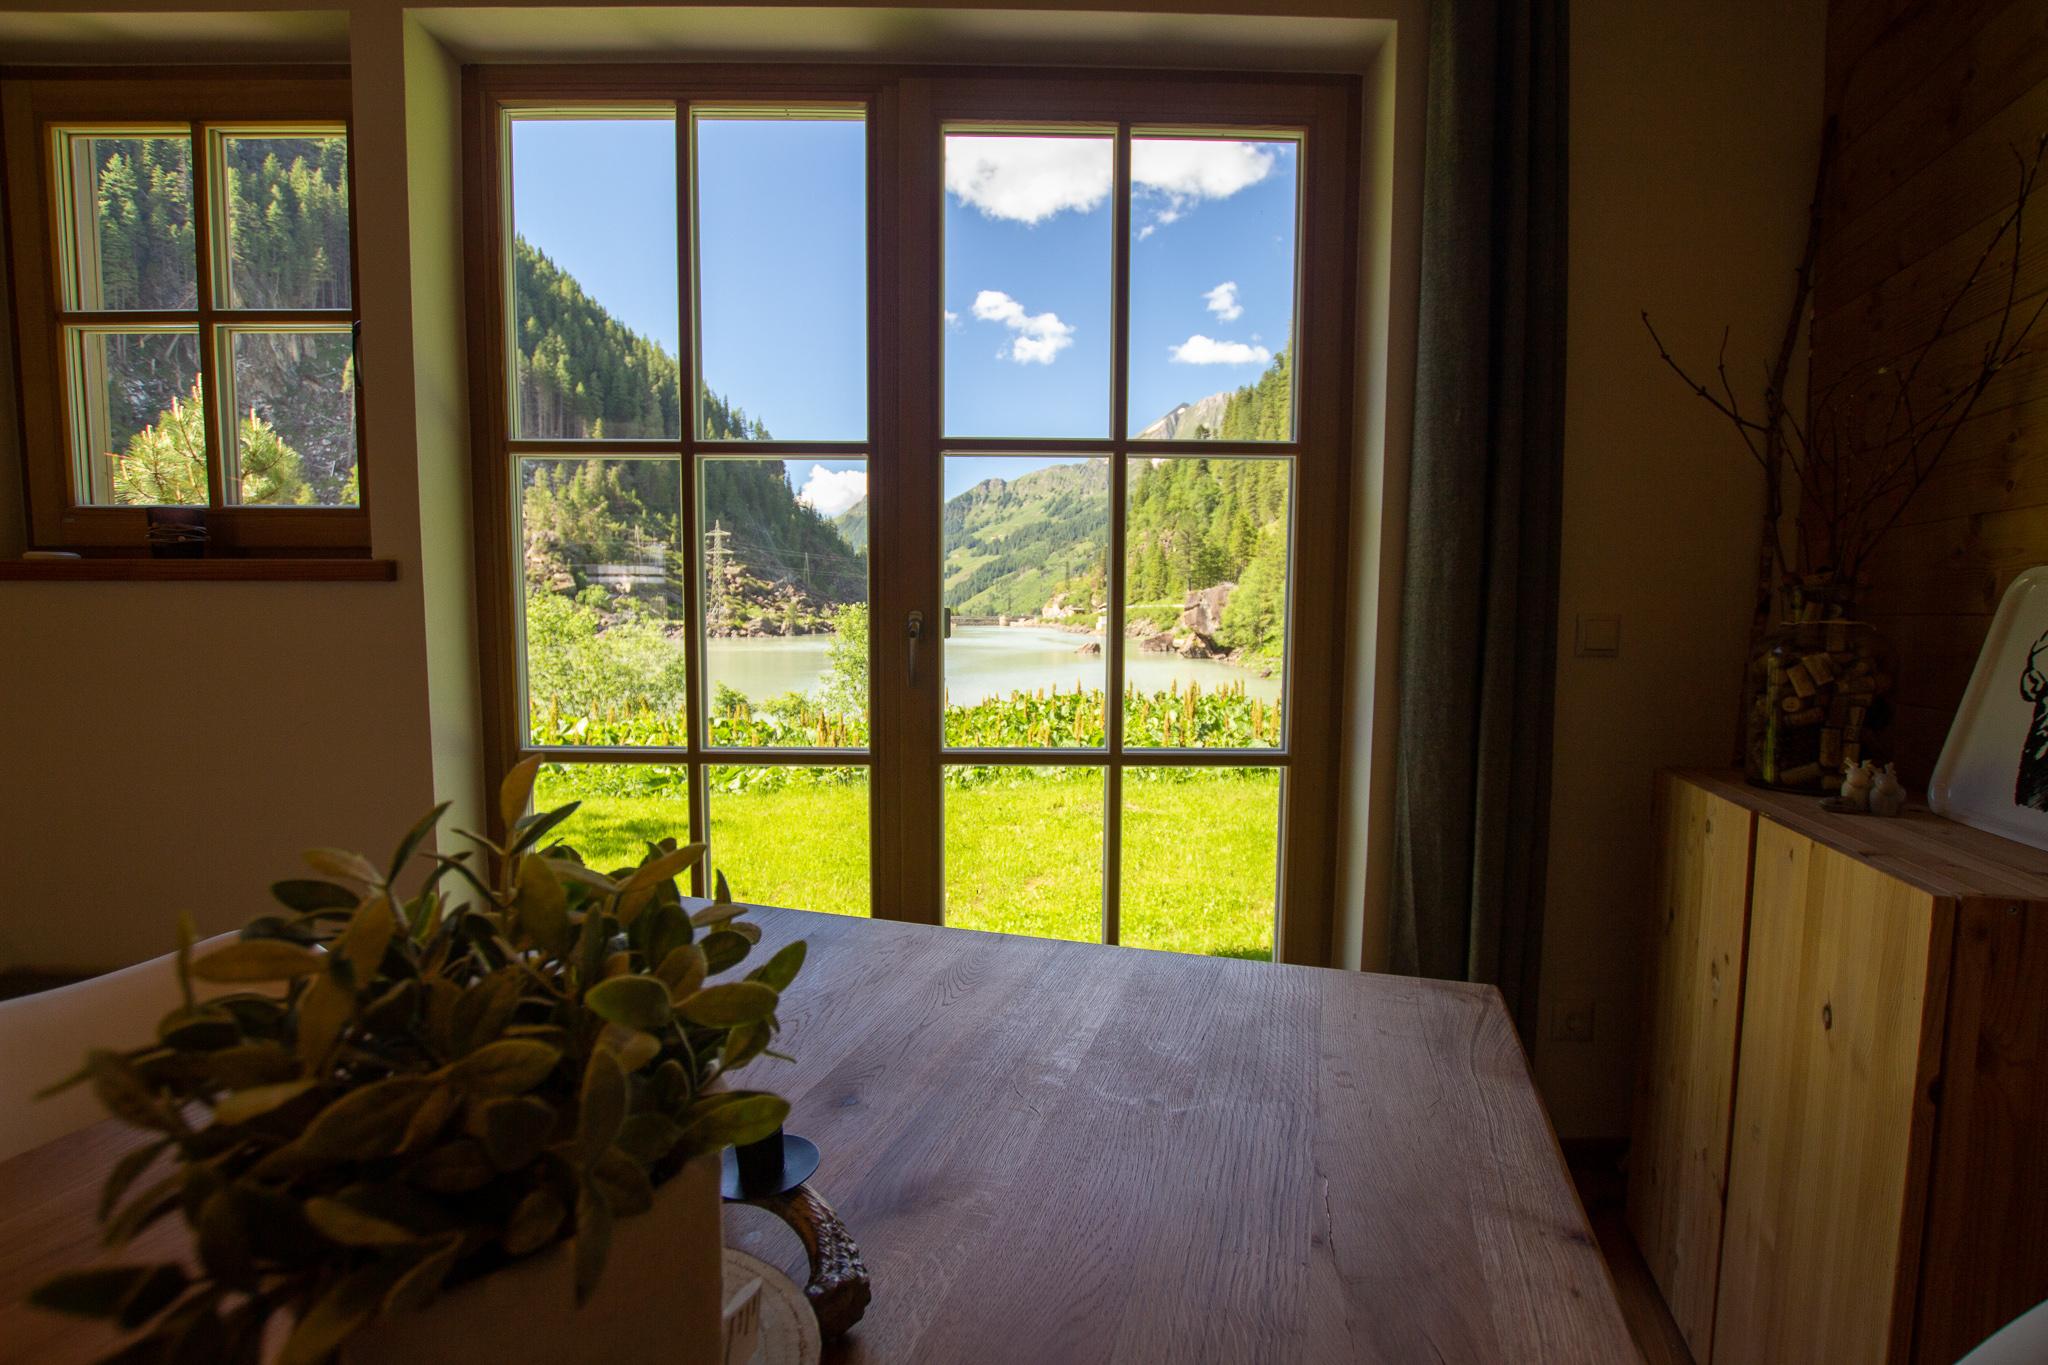 Maison de vacances Lodge Seeblick am Skilift und Bergsee für 5 (2636751), Uttendorf, Pinzgau, Salzbourg, Autriche, image 38